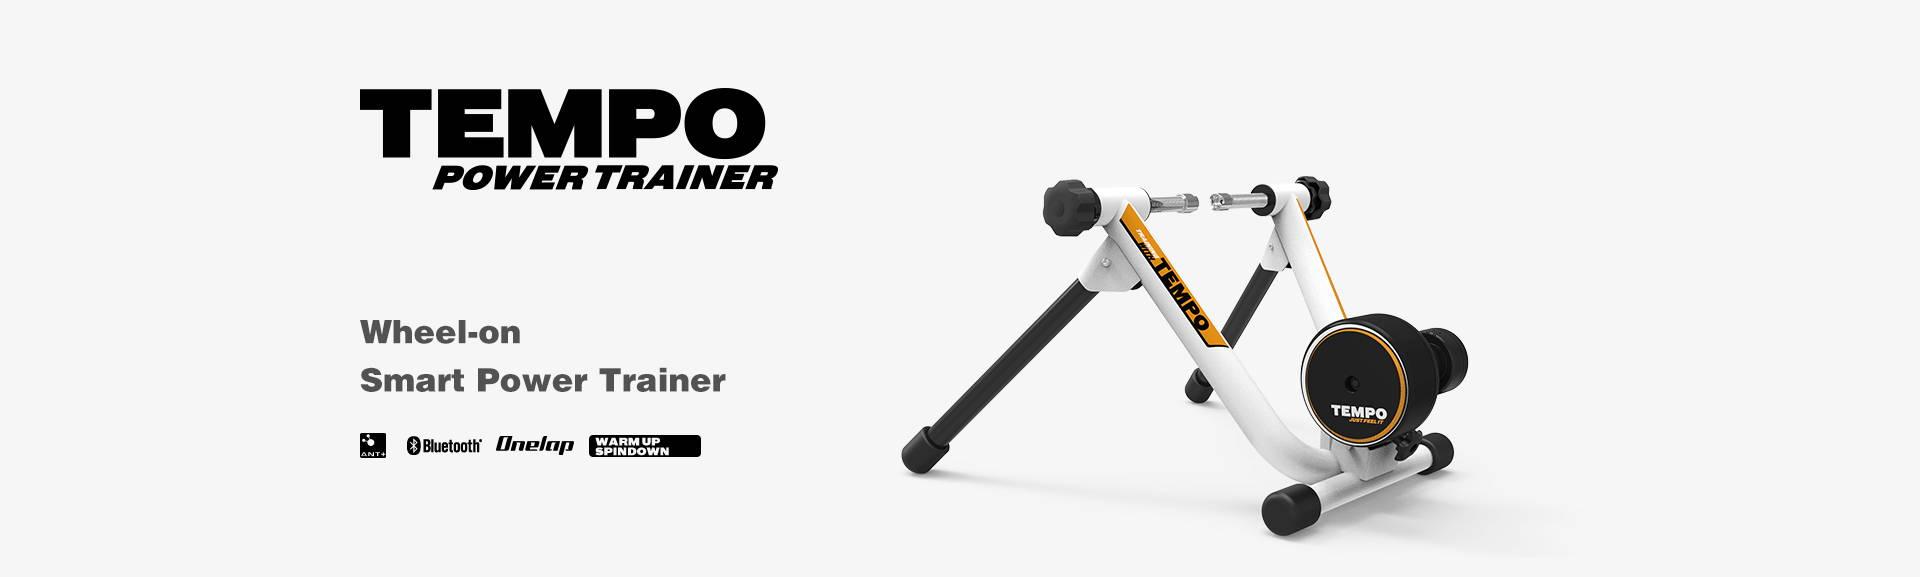 wheel-on smart power trainer